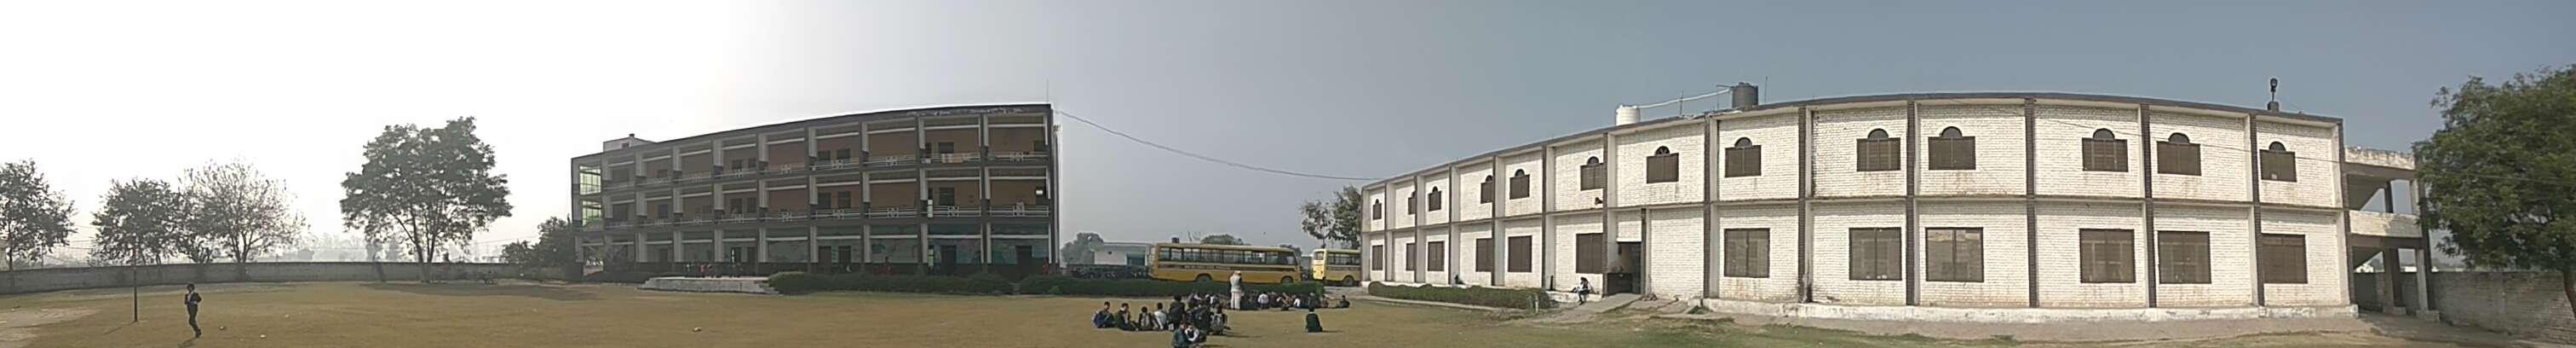 New Era Public School Madlauda Mandi Panipat 530890